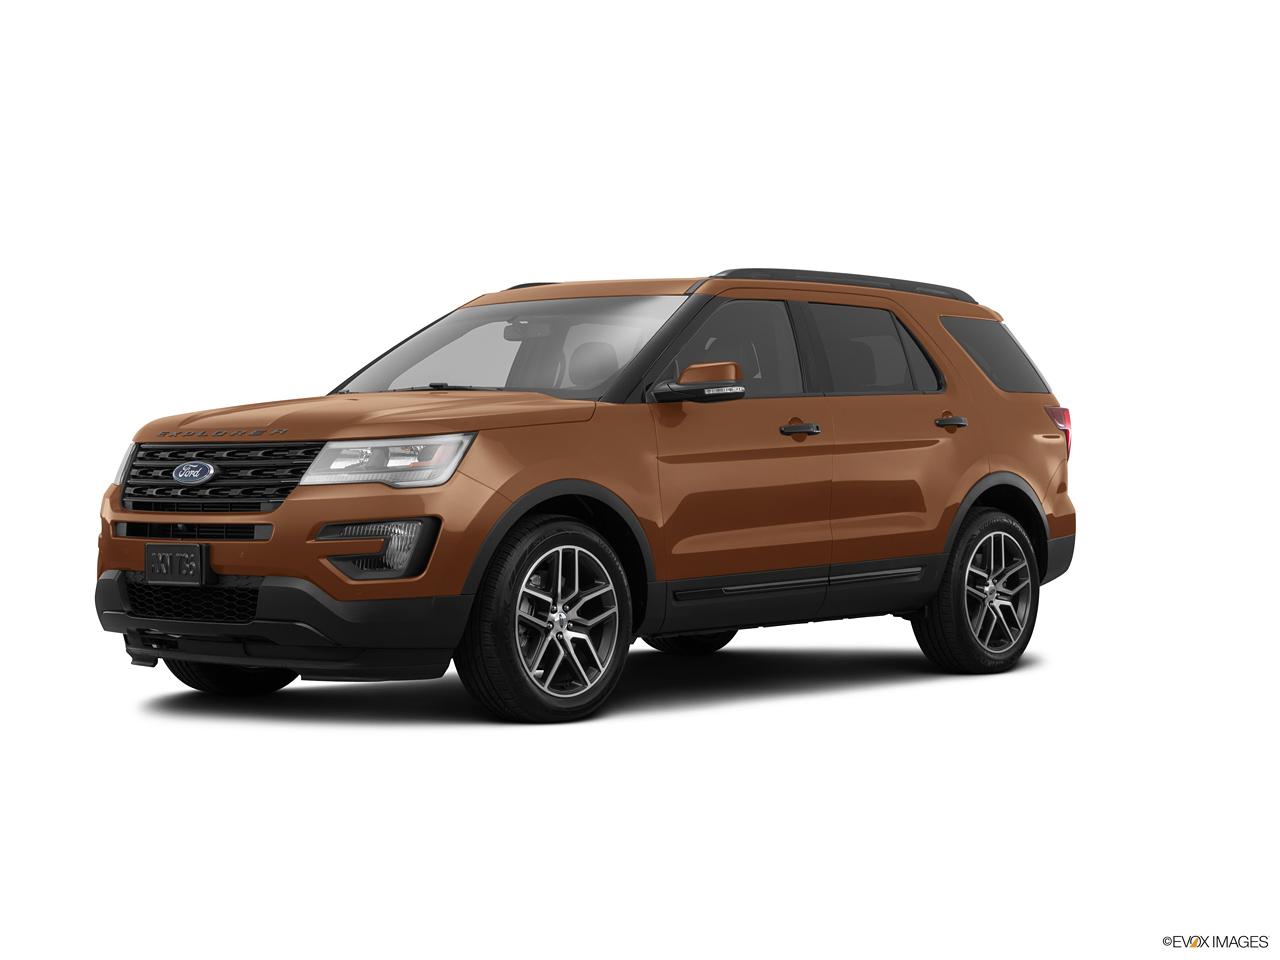 ford explorer 2017 3 5l v6 sport ecoboost in uae new car prices specs reviews photos. Black Bedroom Furniture Sets. Home Design Ideas